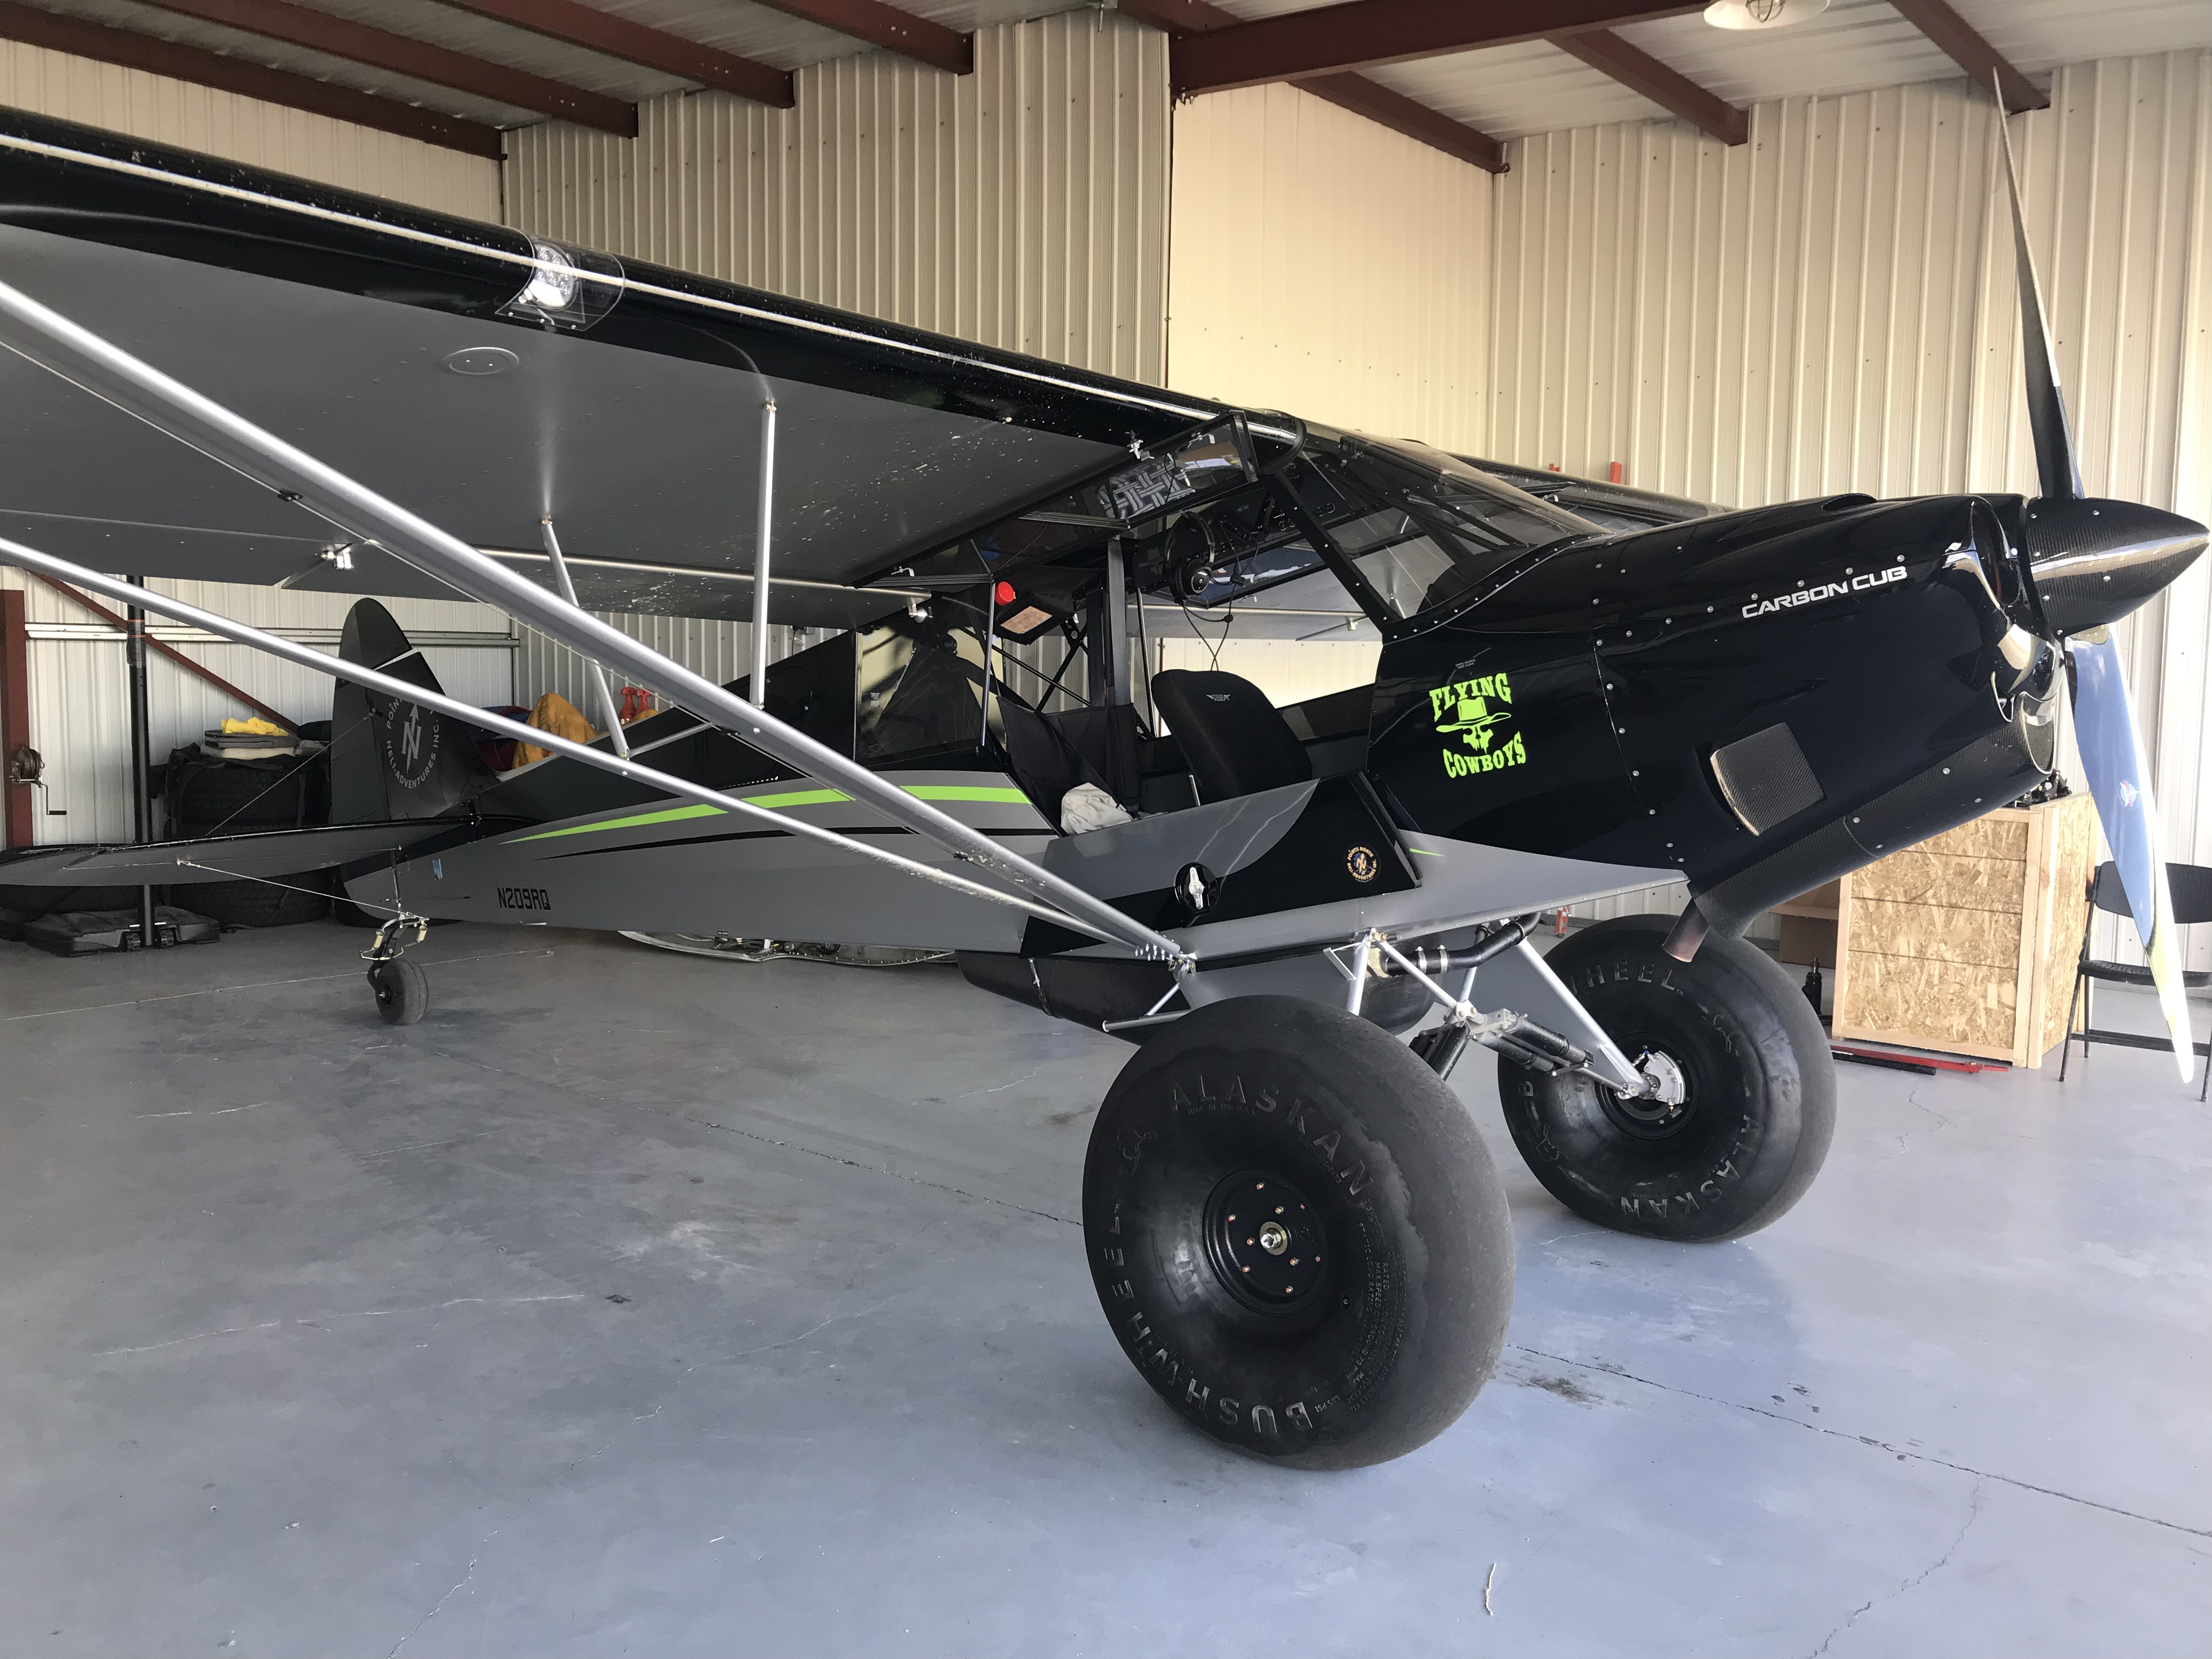 The Planes: 1953 Cessna 180, 2016 Backcountry Super Cub, 2018 Carbon